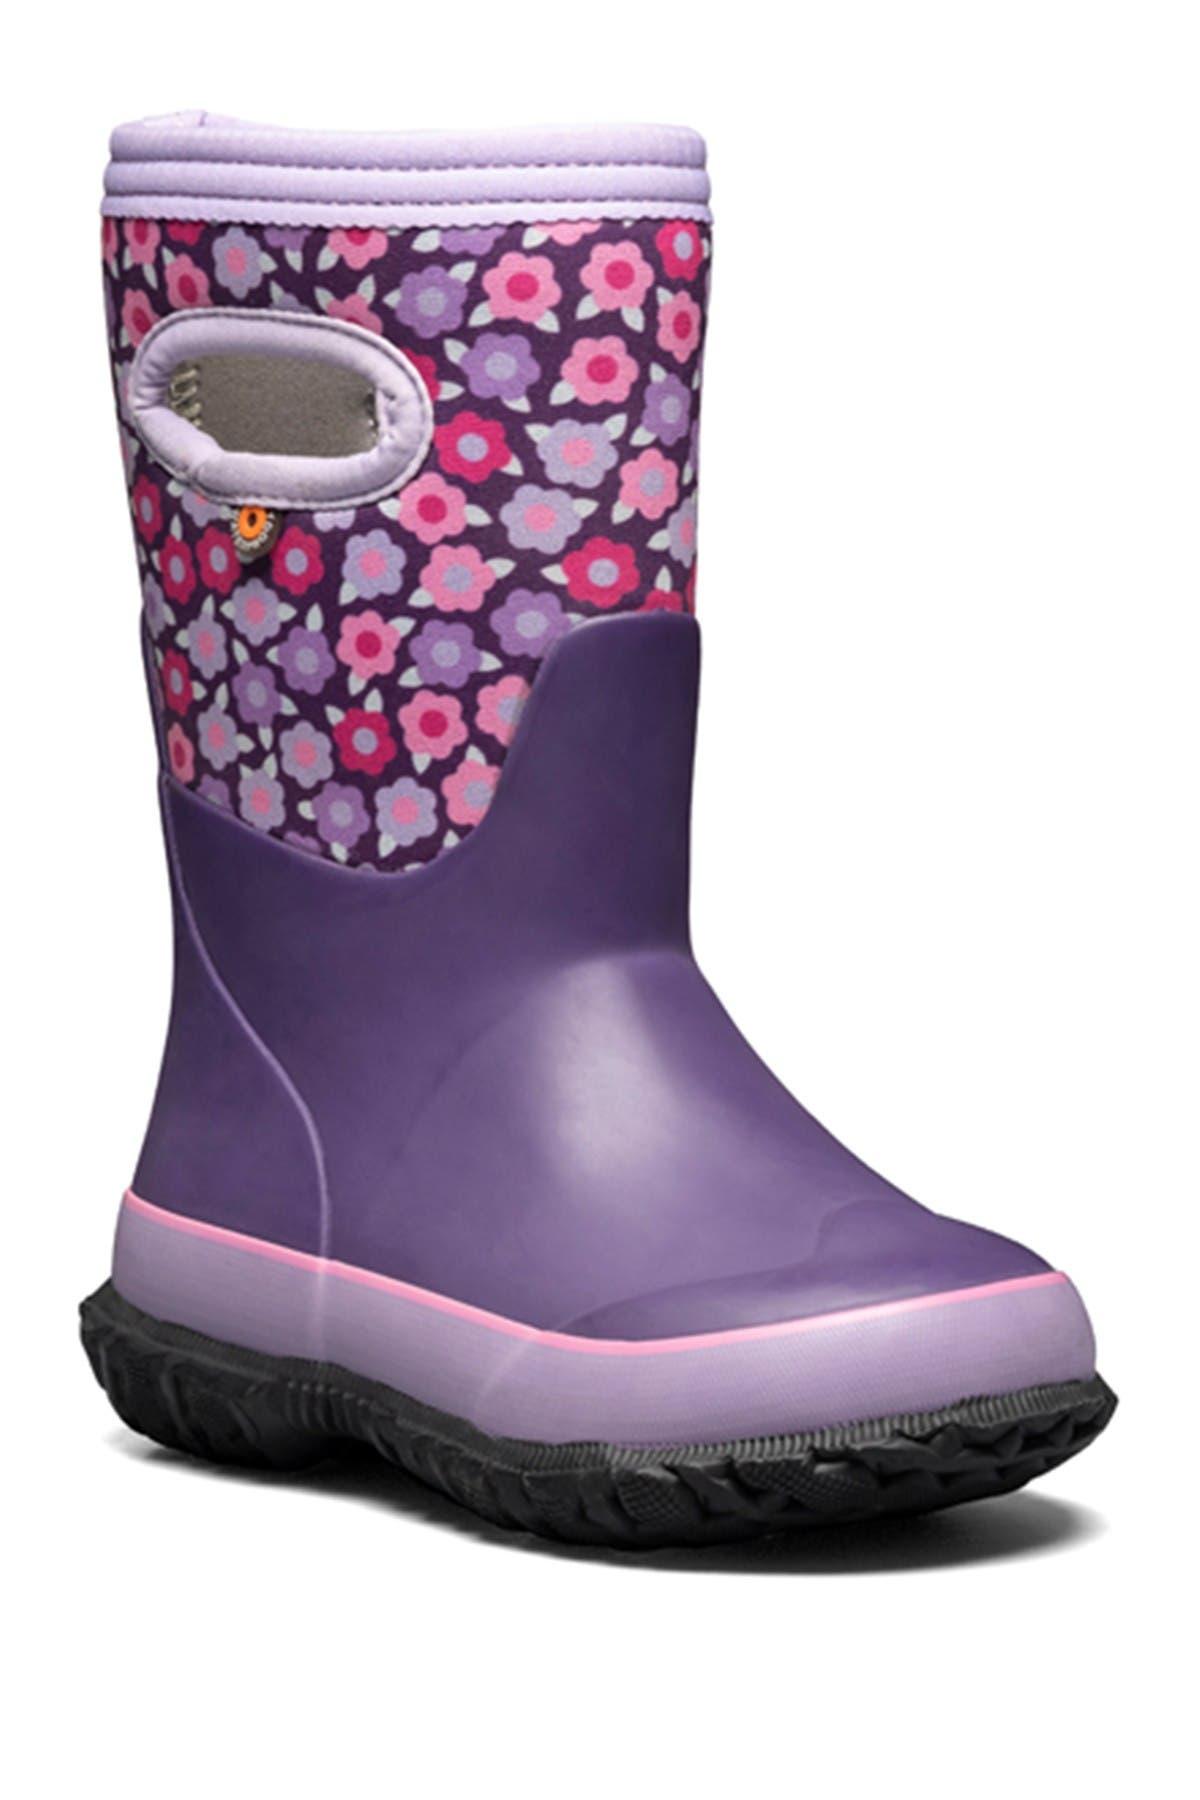 Image of Bogs Grasp Pop Flowers Winter Boot